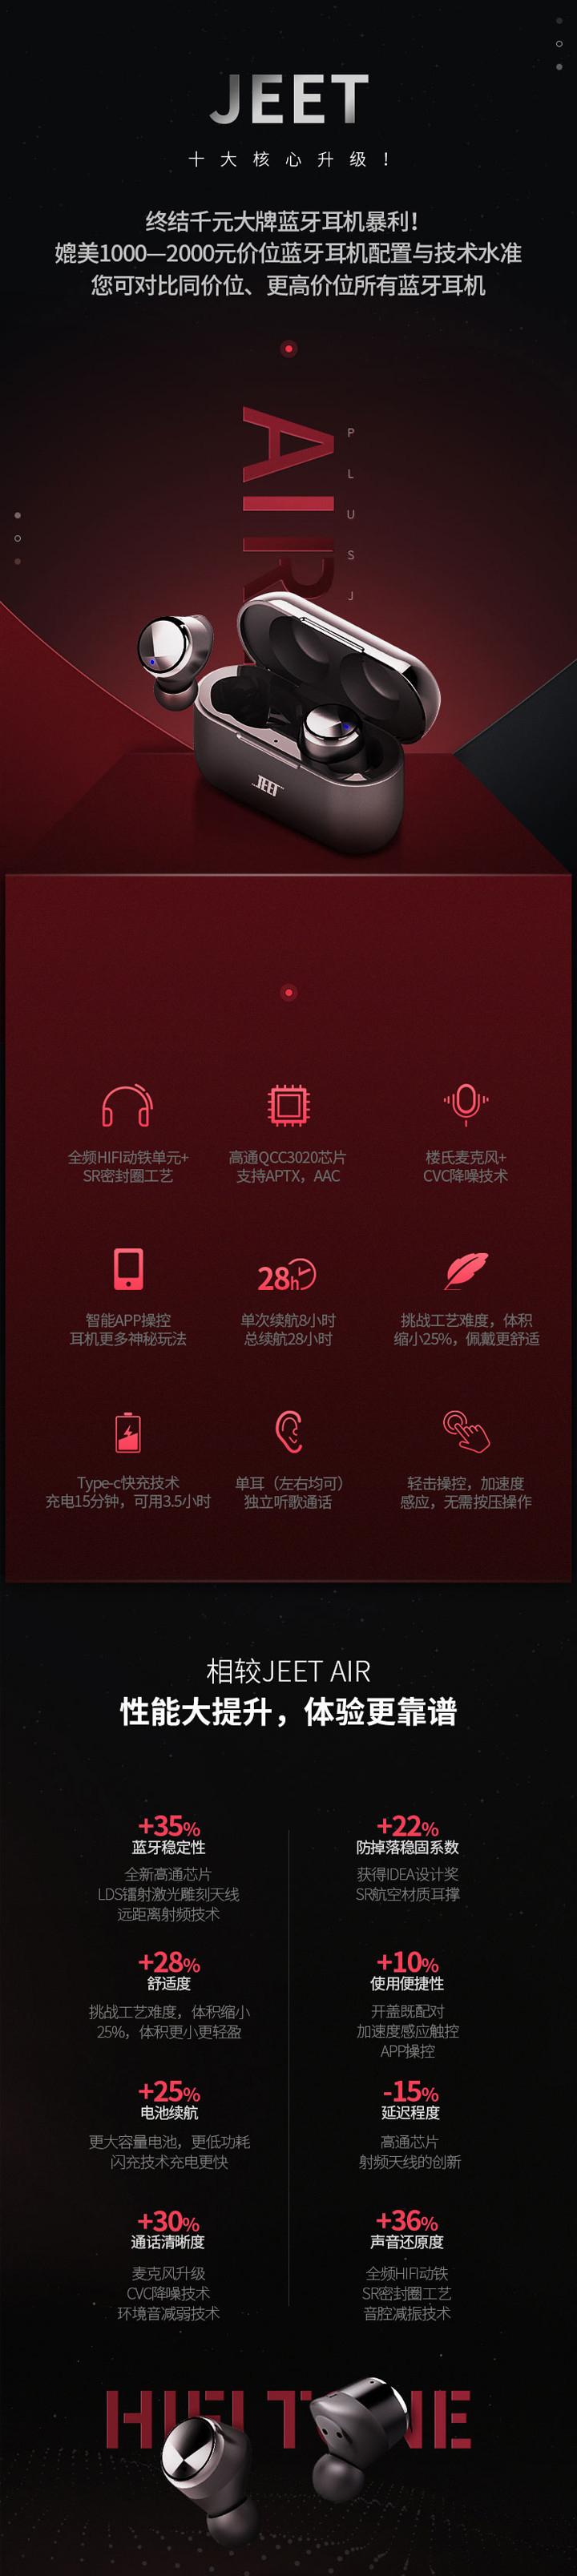 JEET AIR PLUS真无线蓝牙耳机免费试用,评测